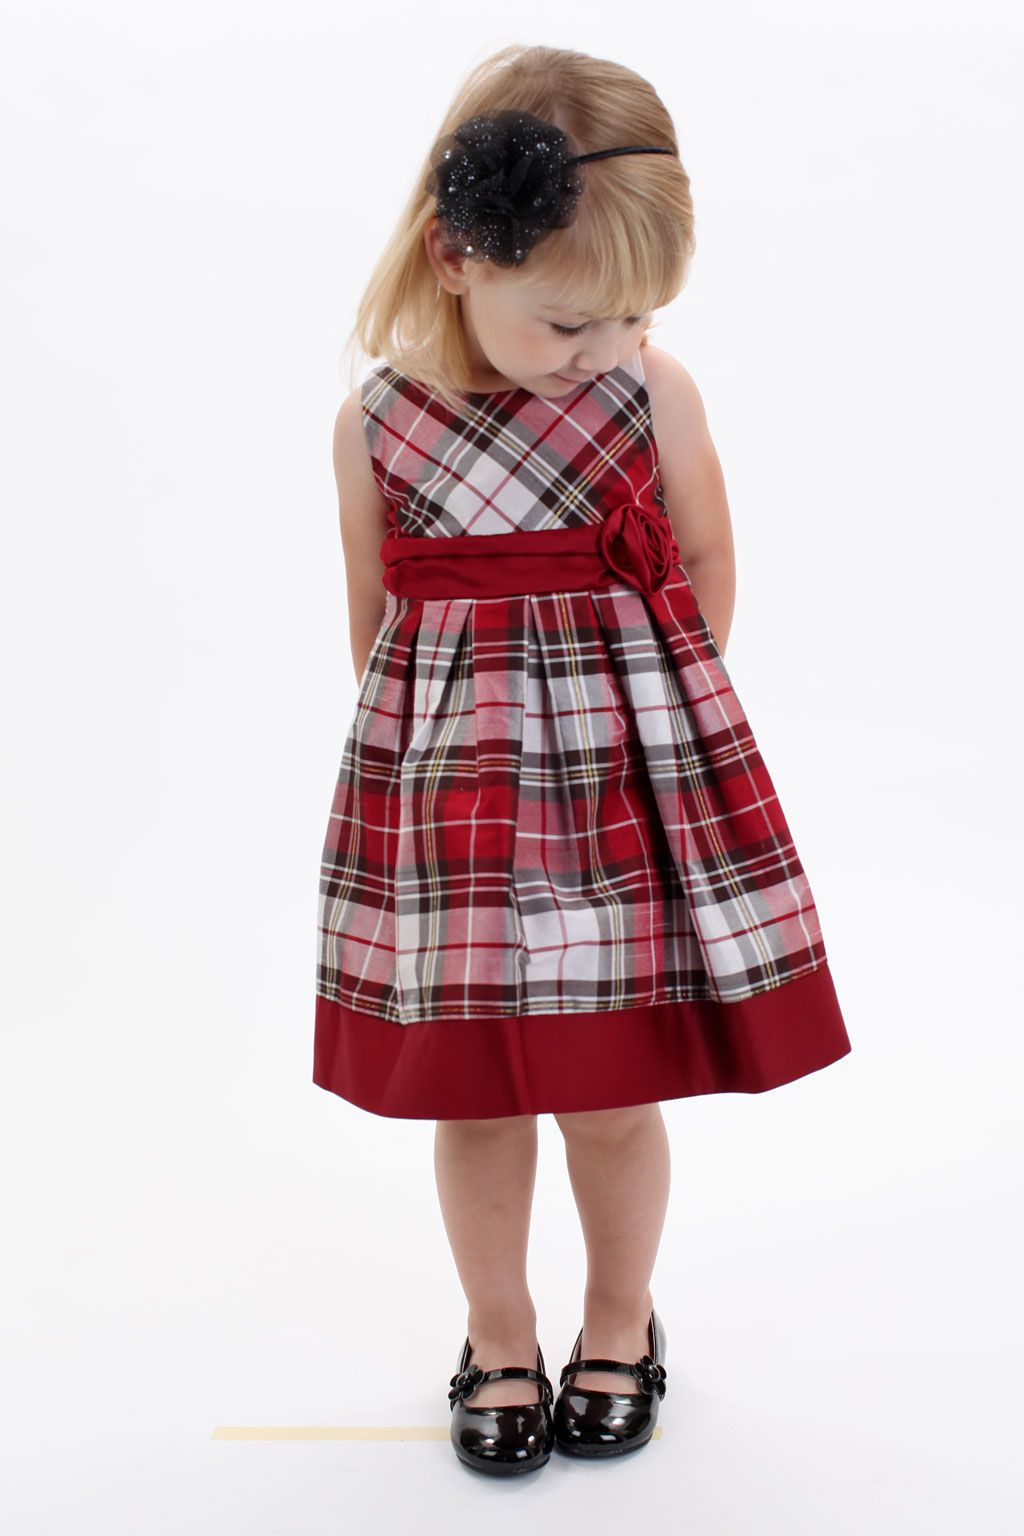 615be720791fd DN_954 - Flower Girl/Holiday Dress Style 954-Red Tartan SALE-  9MTH,12MTH,18MTH,24MTHS AND 36MTHS - Holiday Dresses - Flower Girl Dress For  Less